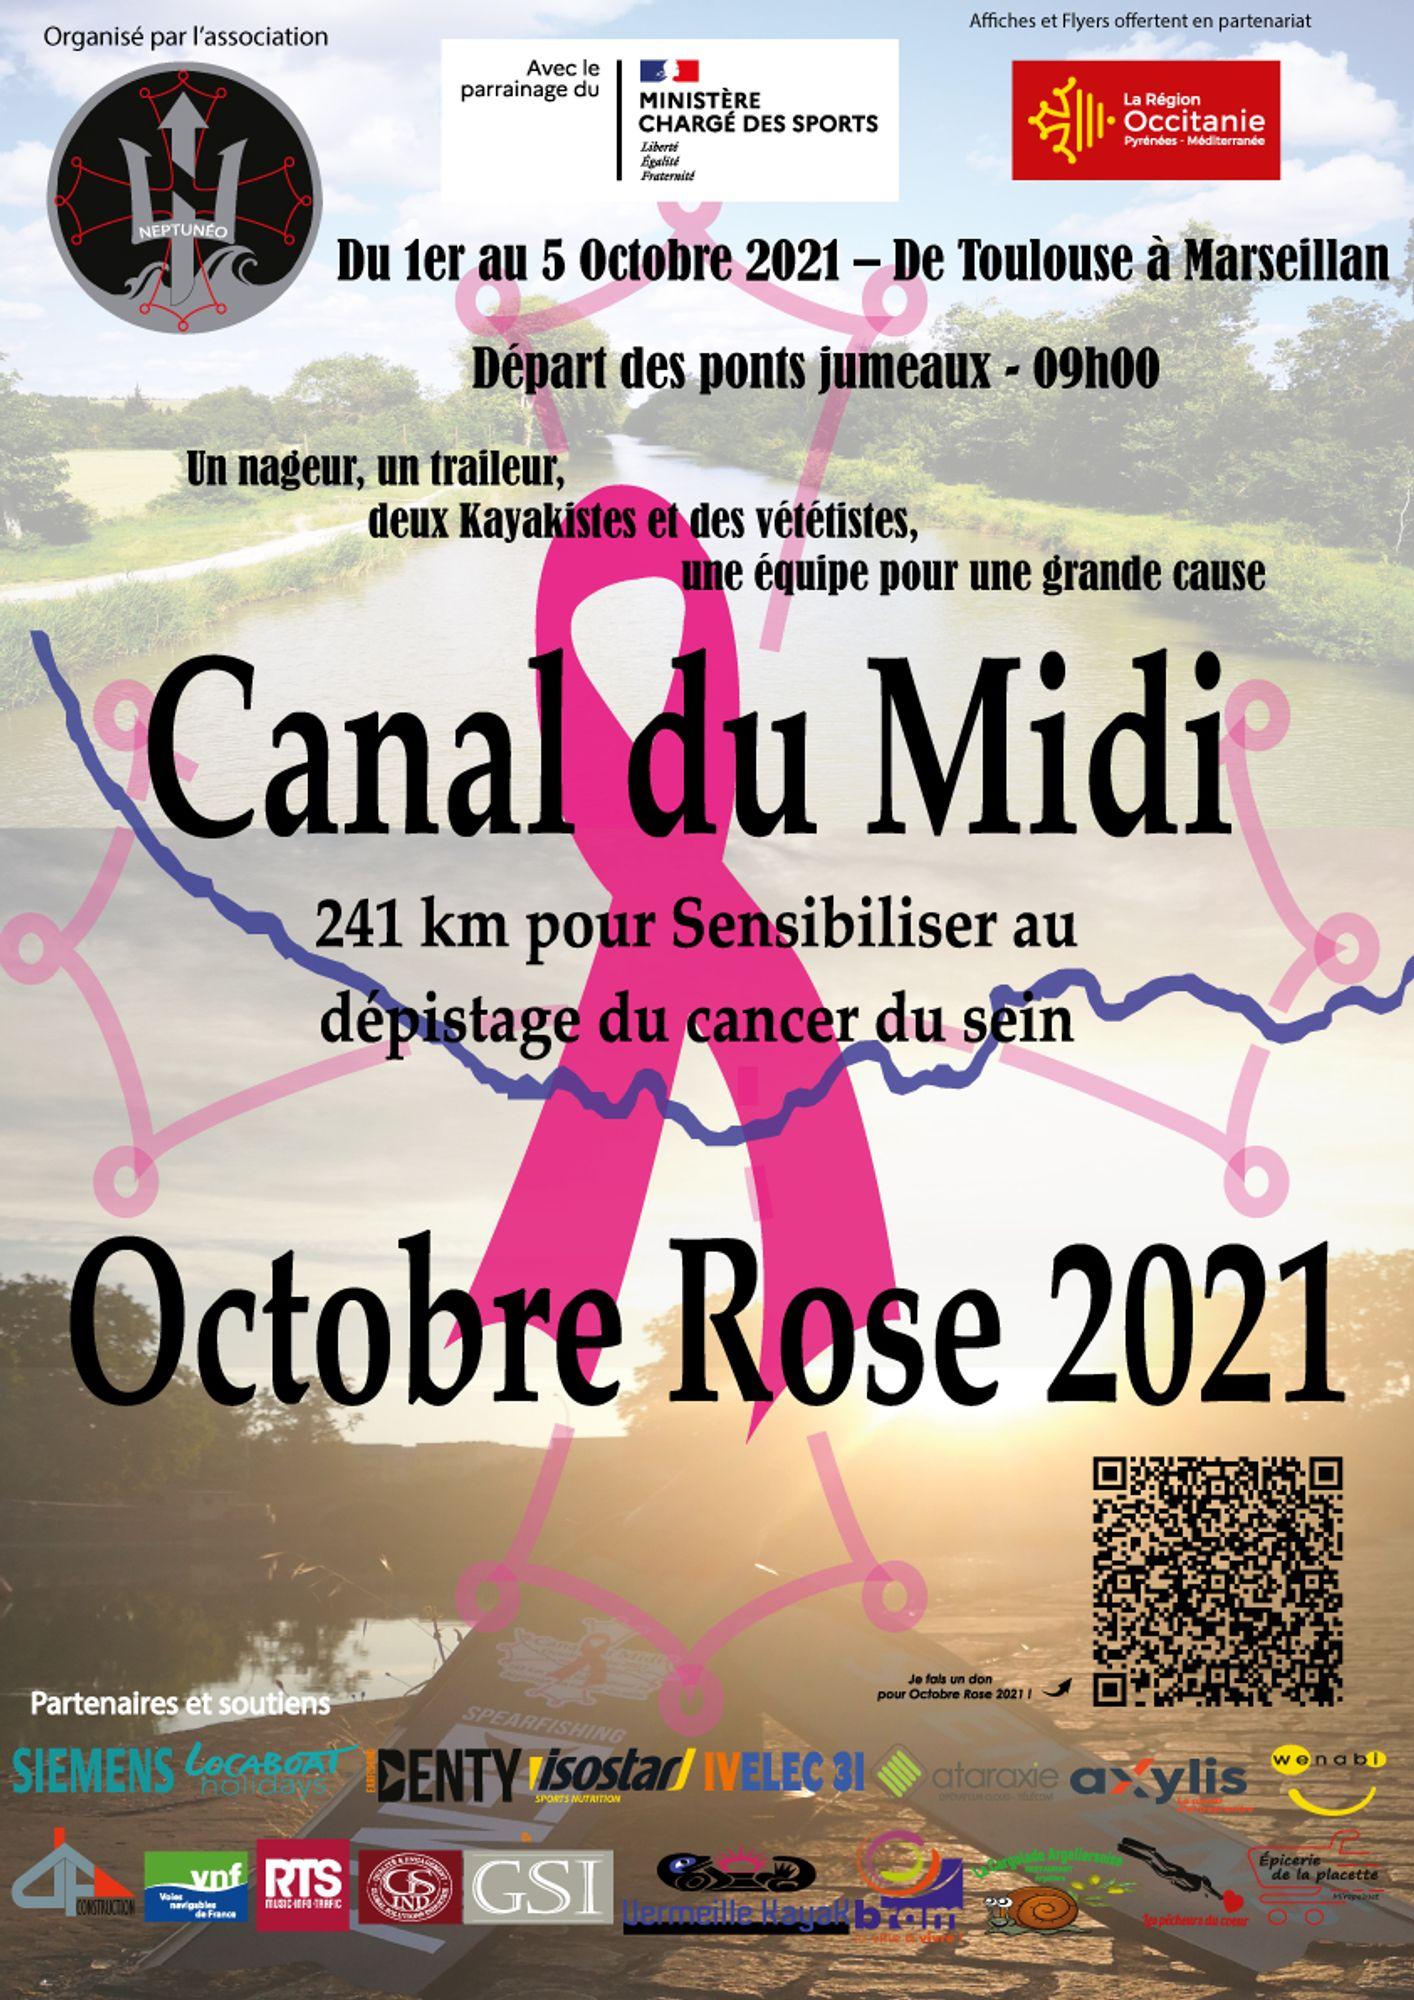 Descente canal du Midi / Octobre rose